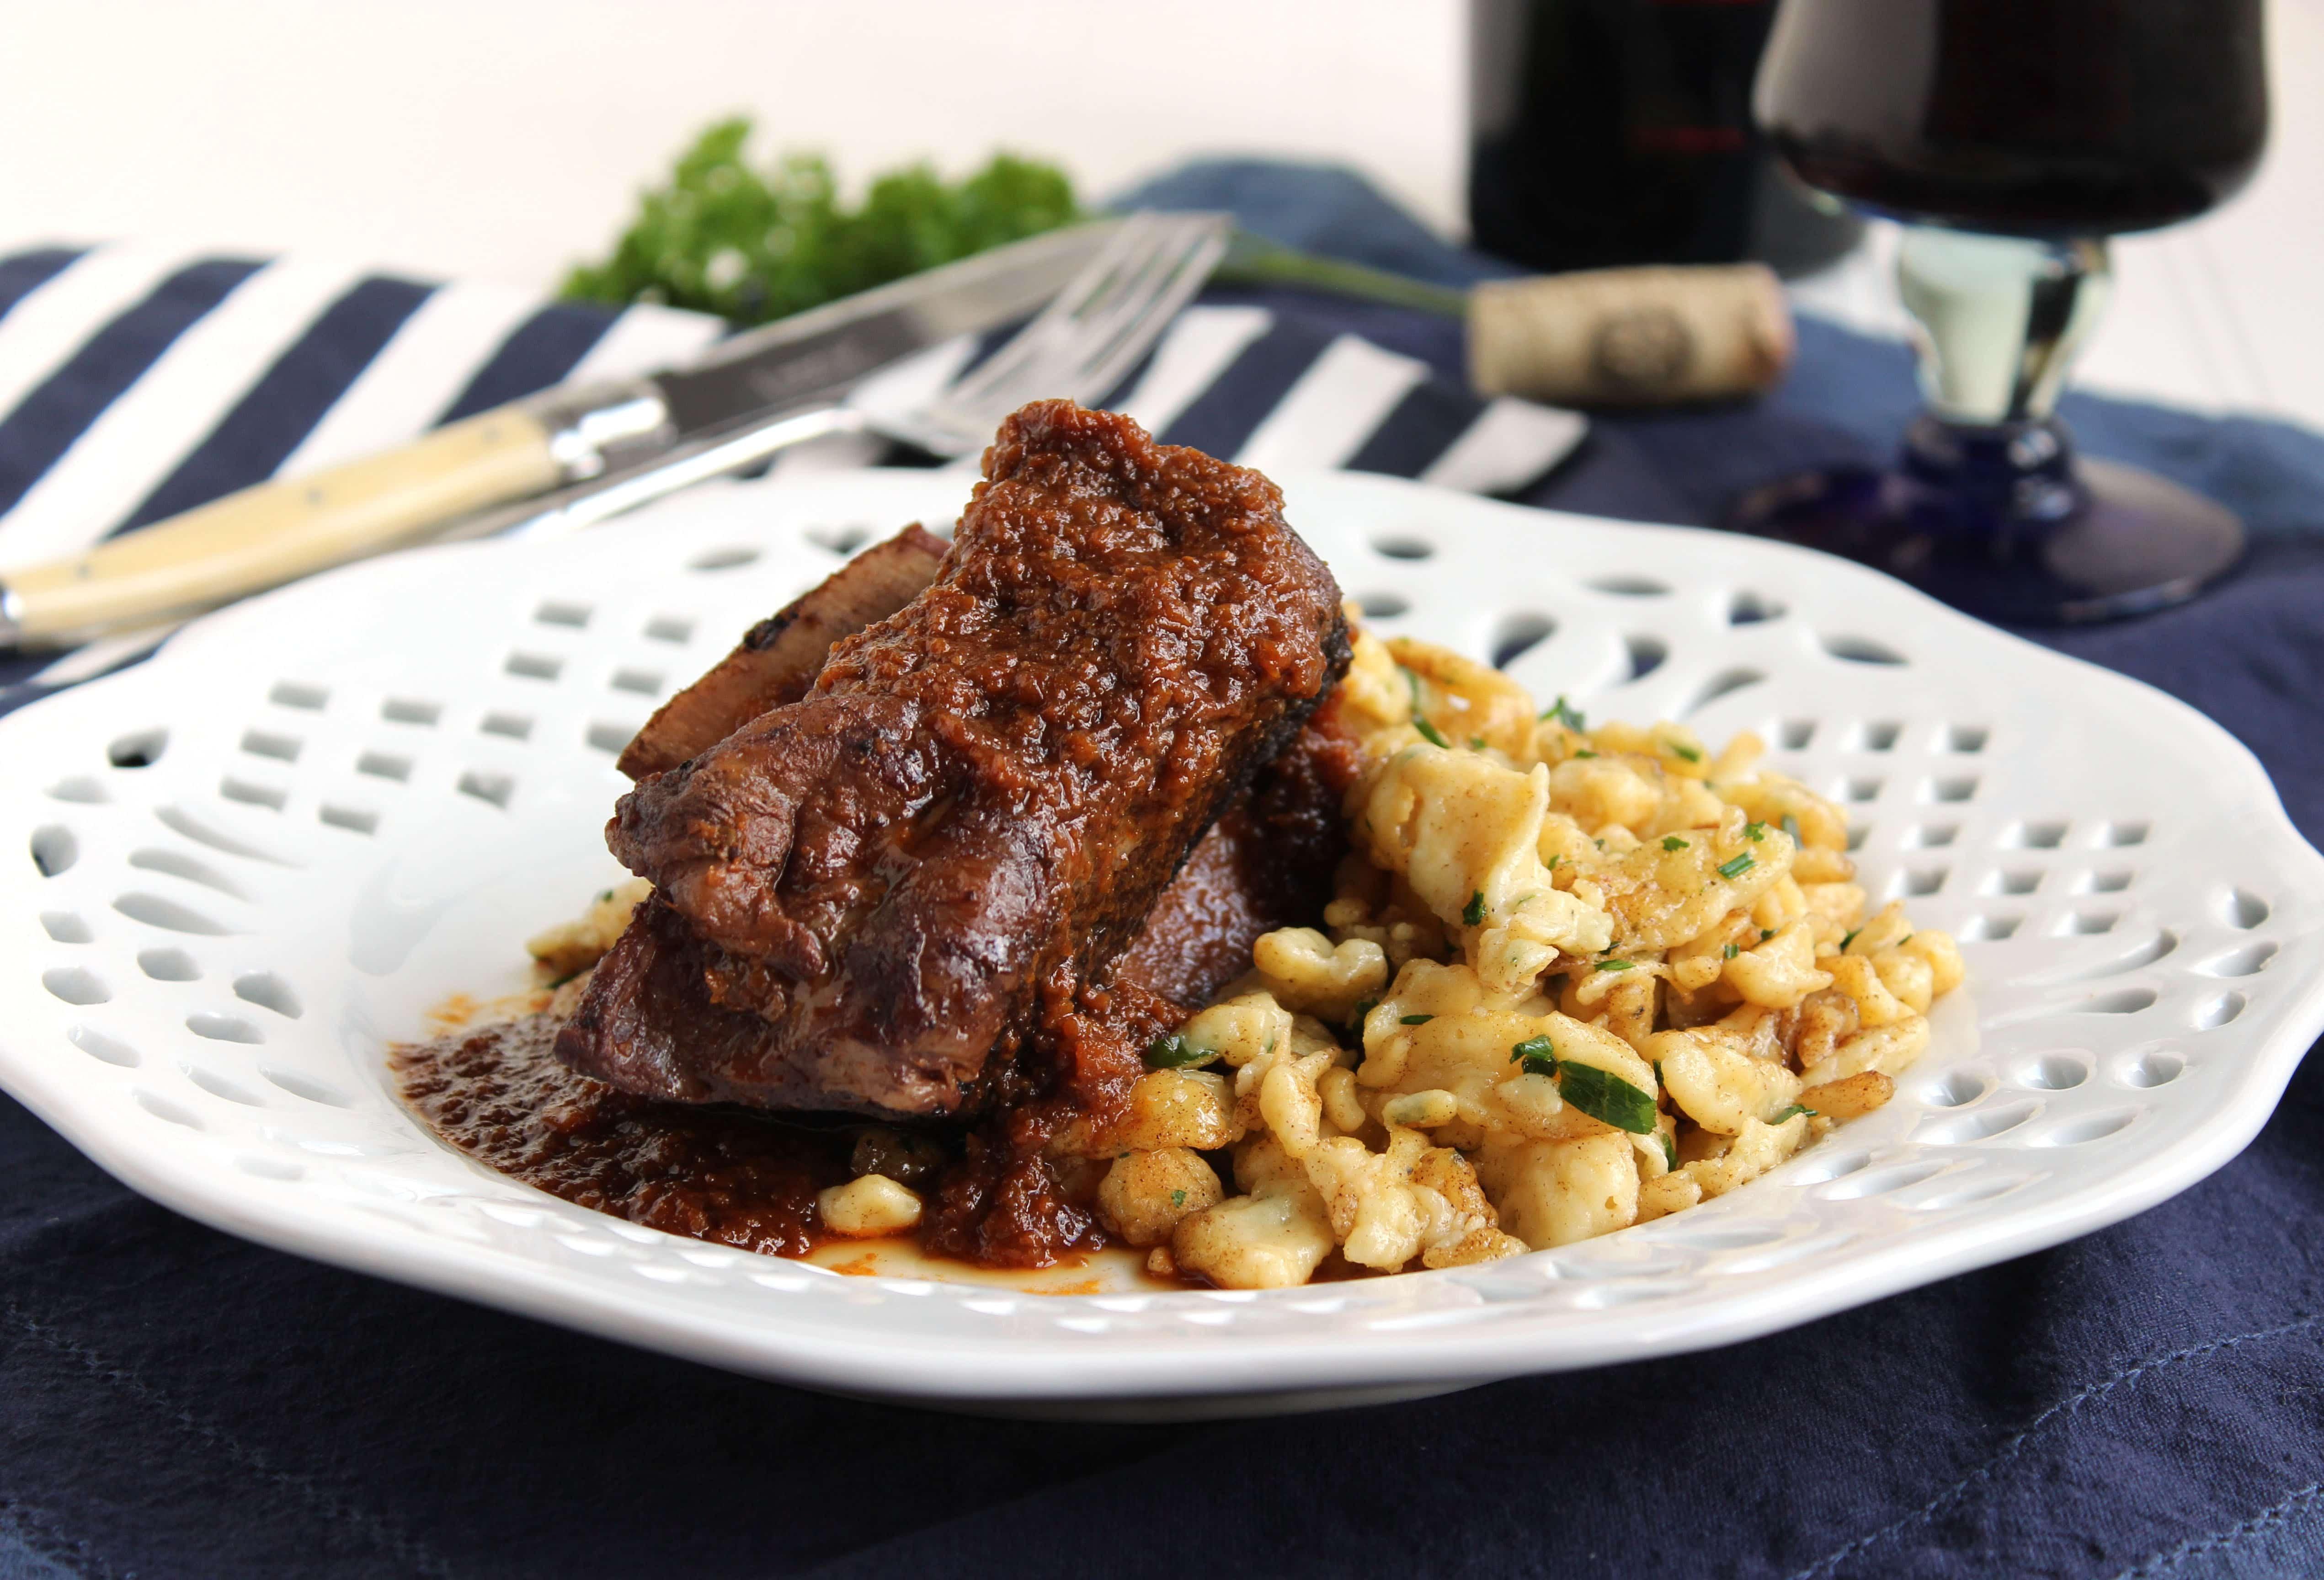 Braised Beef Short Ribs  Slow Cooker Braised Beef Short Ribs with Herbed Spaetzle